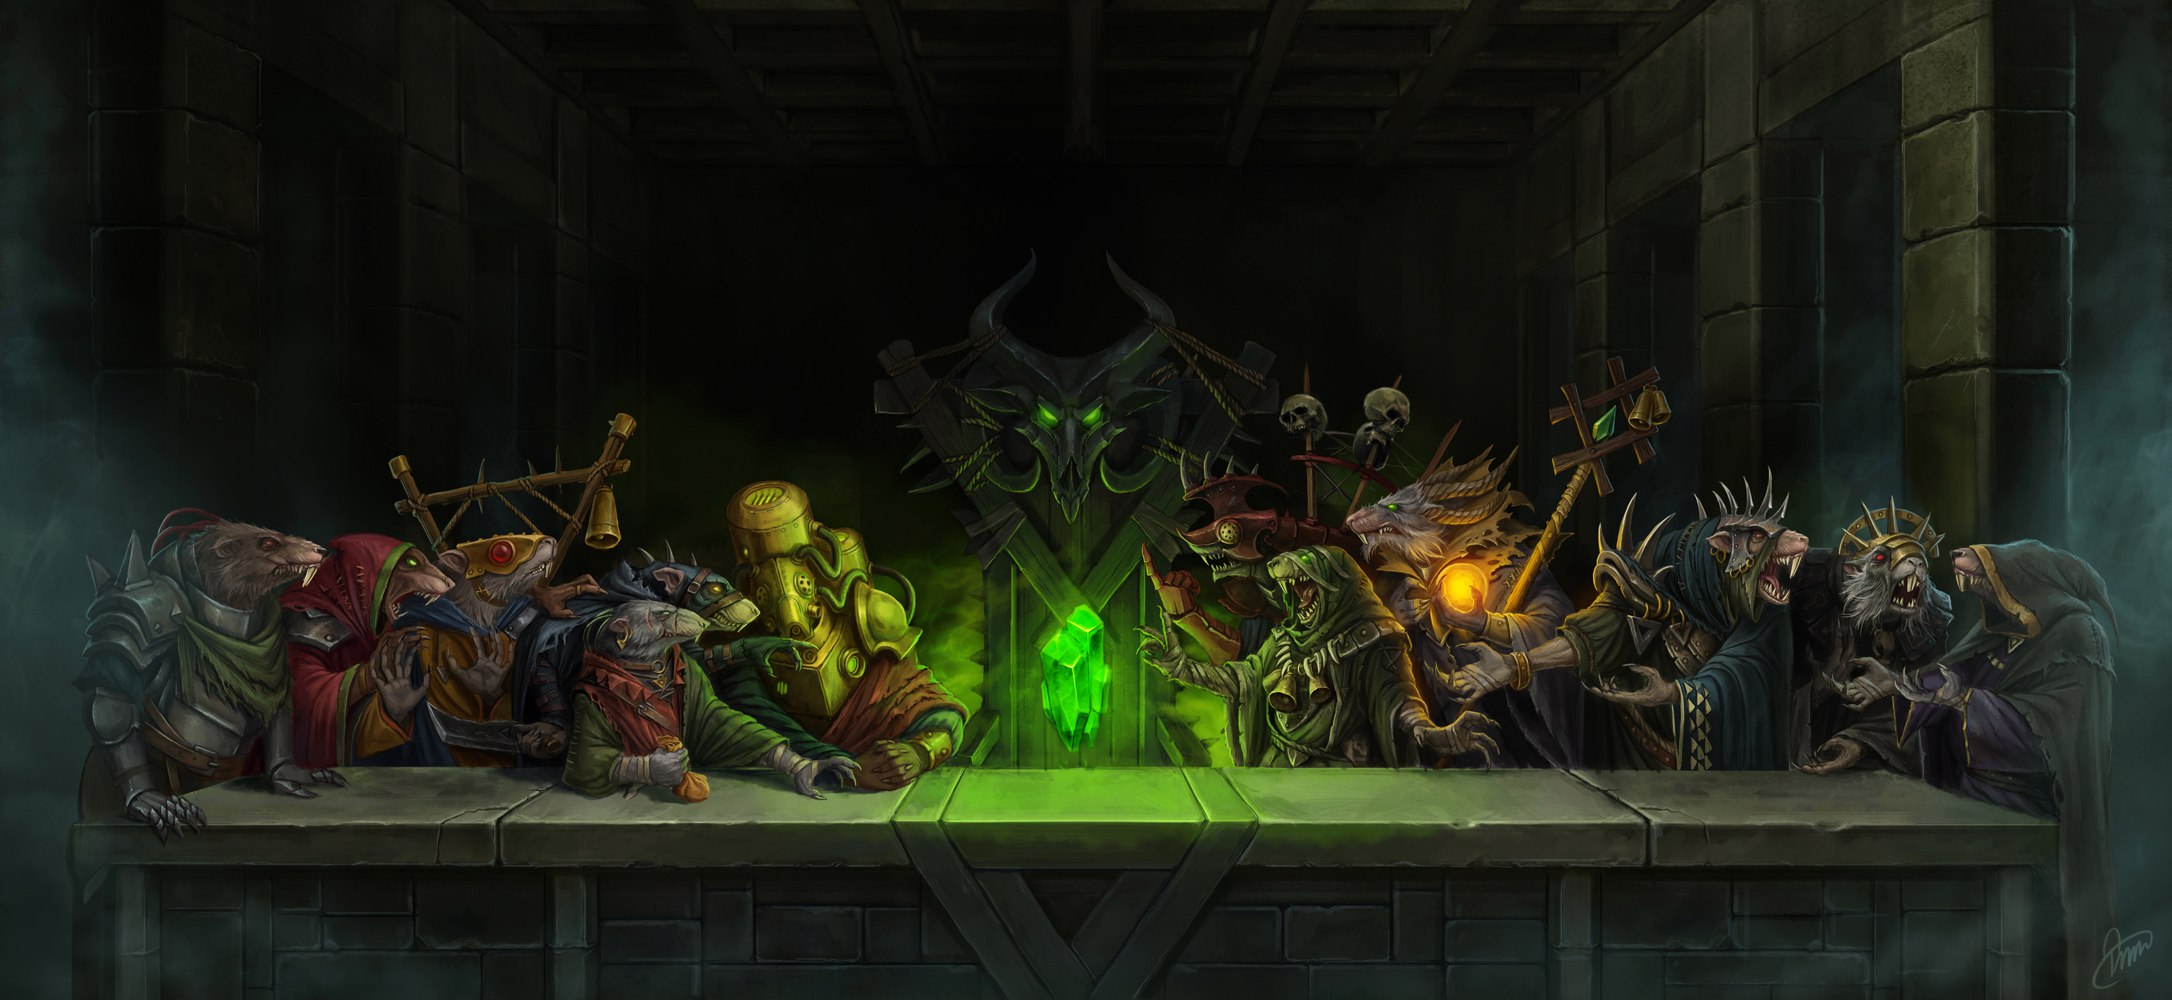 The Council of Thirteen Warhammer Fantasy